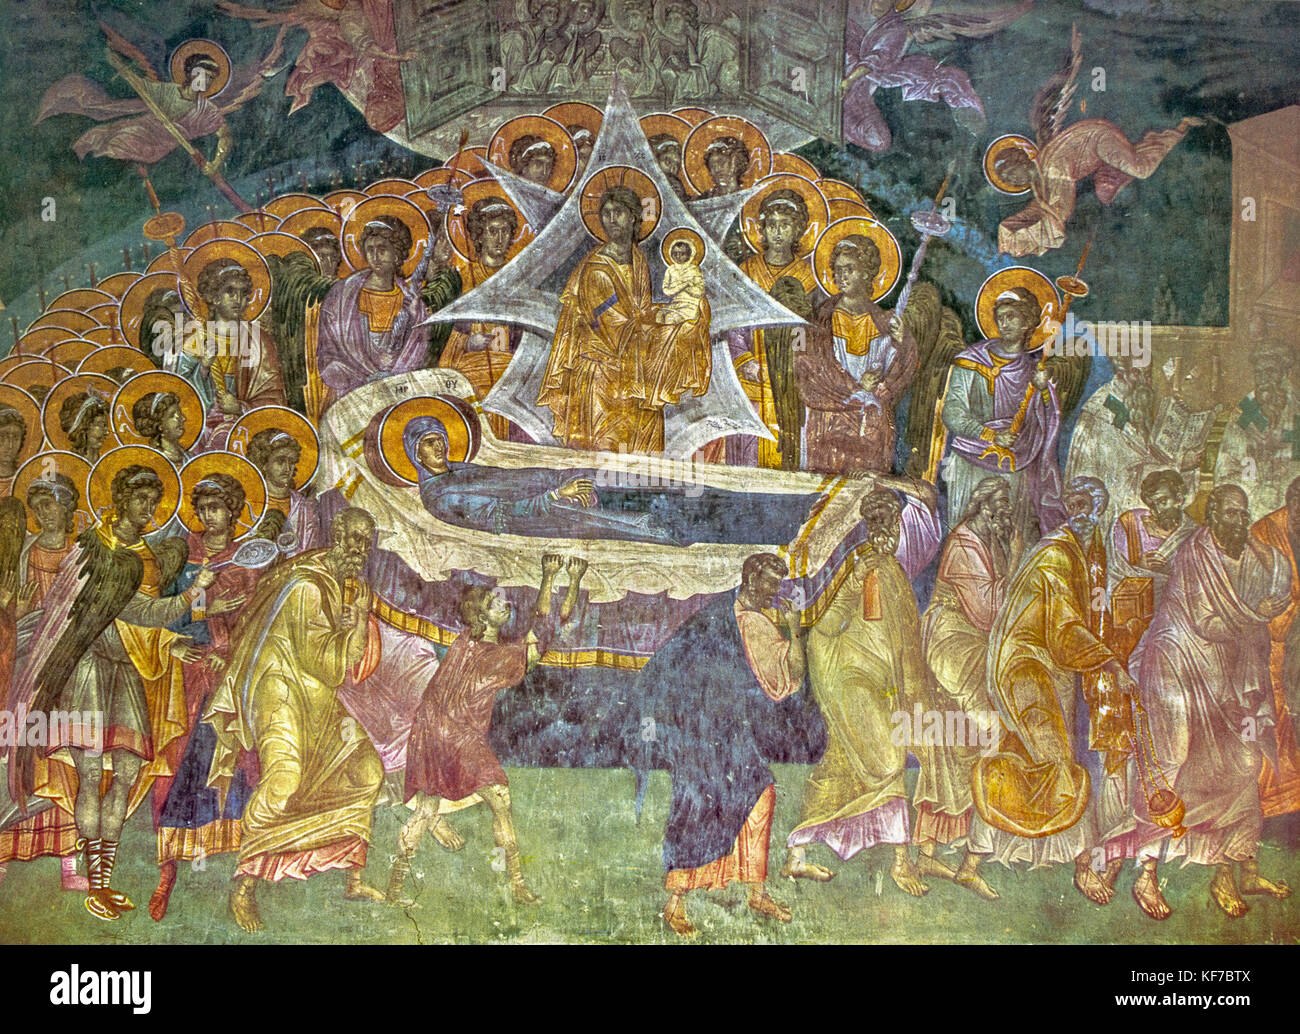 Serbia - Sopocani Monasteri -Dormition of the virgin - fresco 1265